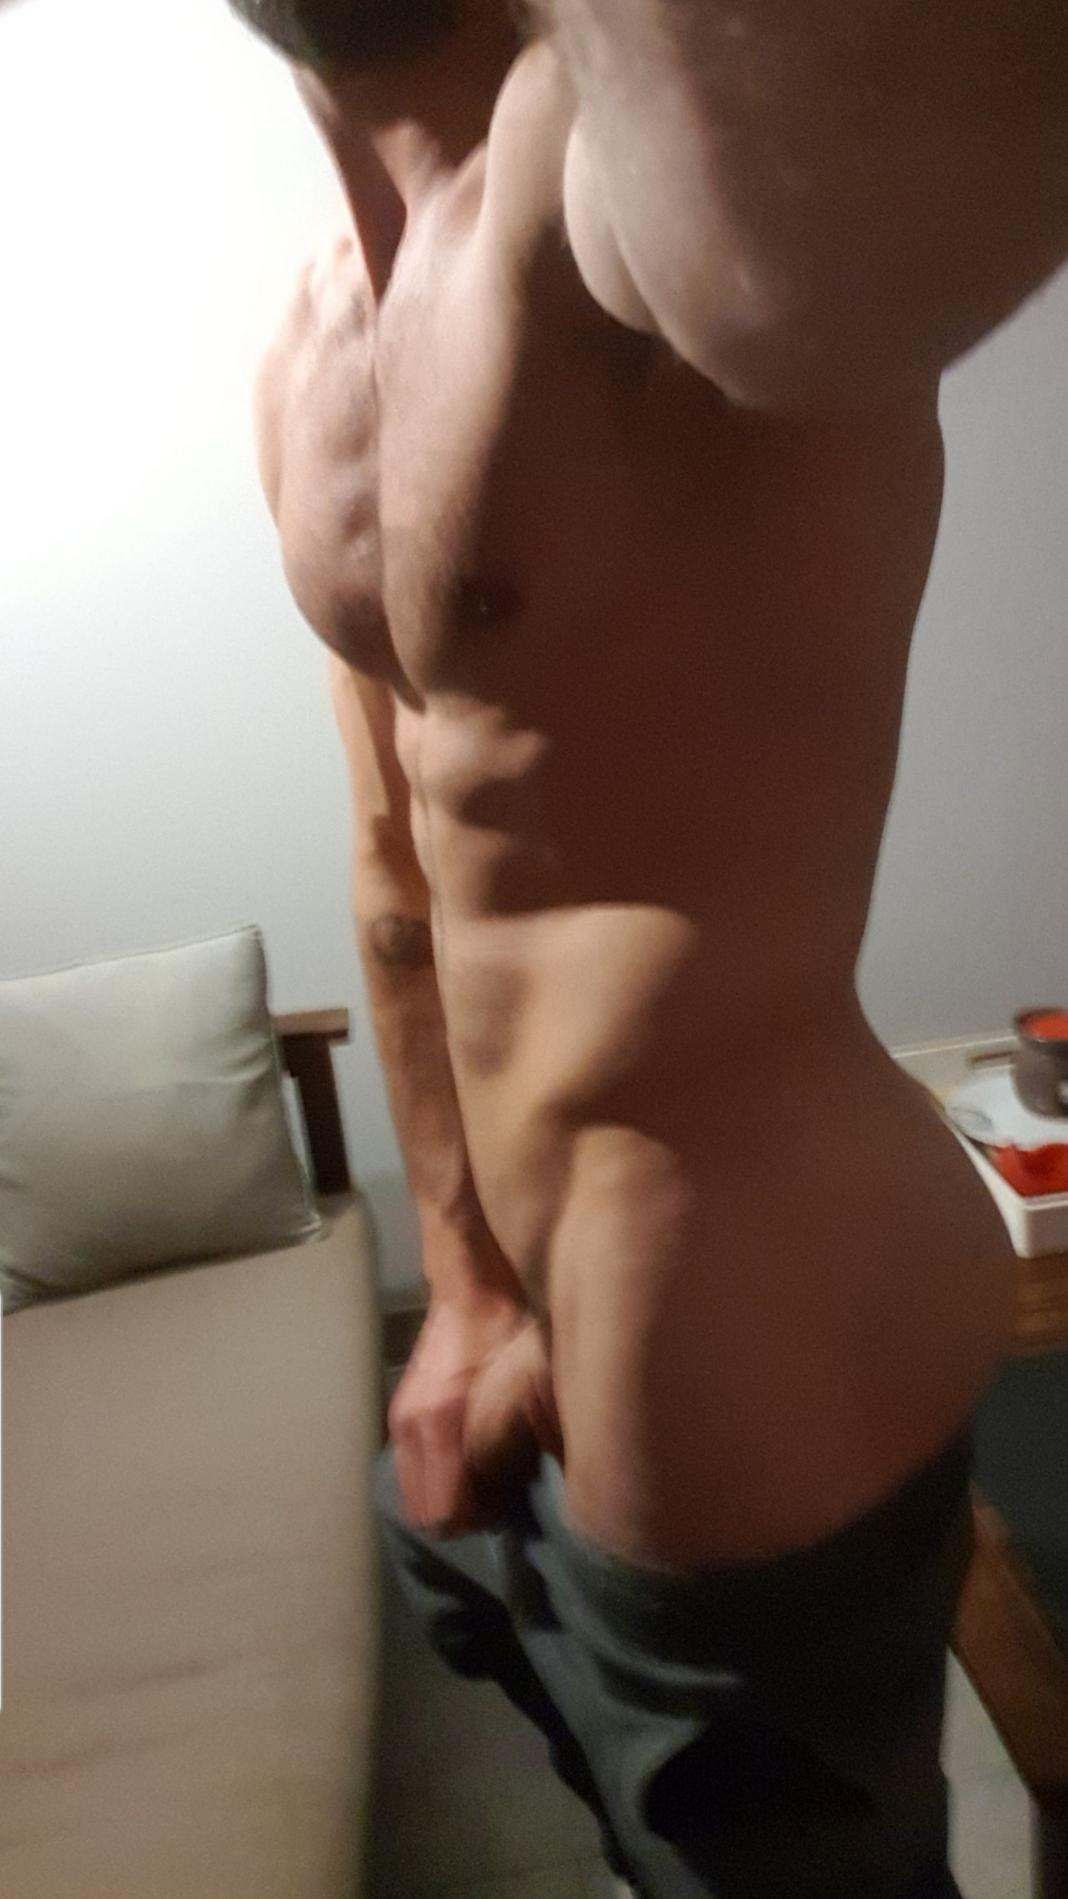 Jeunemale5 sexy?s=rwhmavrpuyjo4hcj3jdsjelll9dysdateyvxnmngj+s=